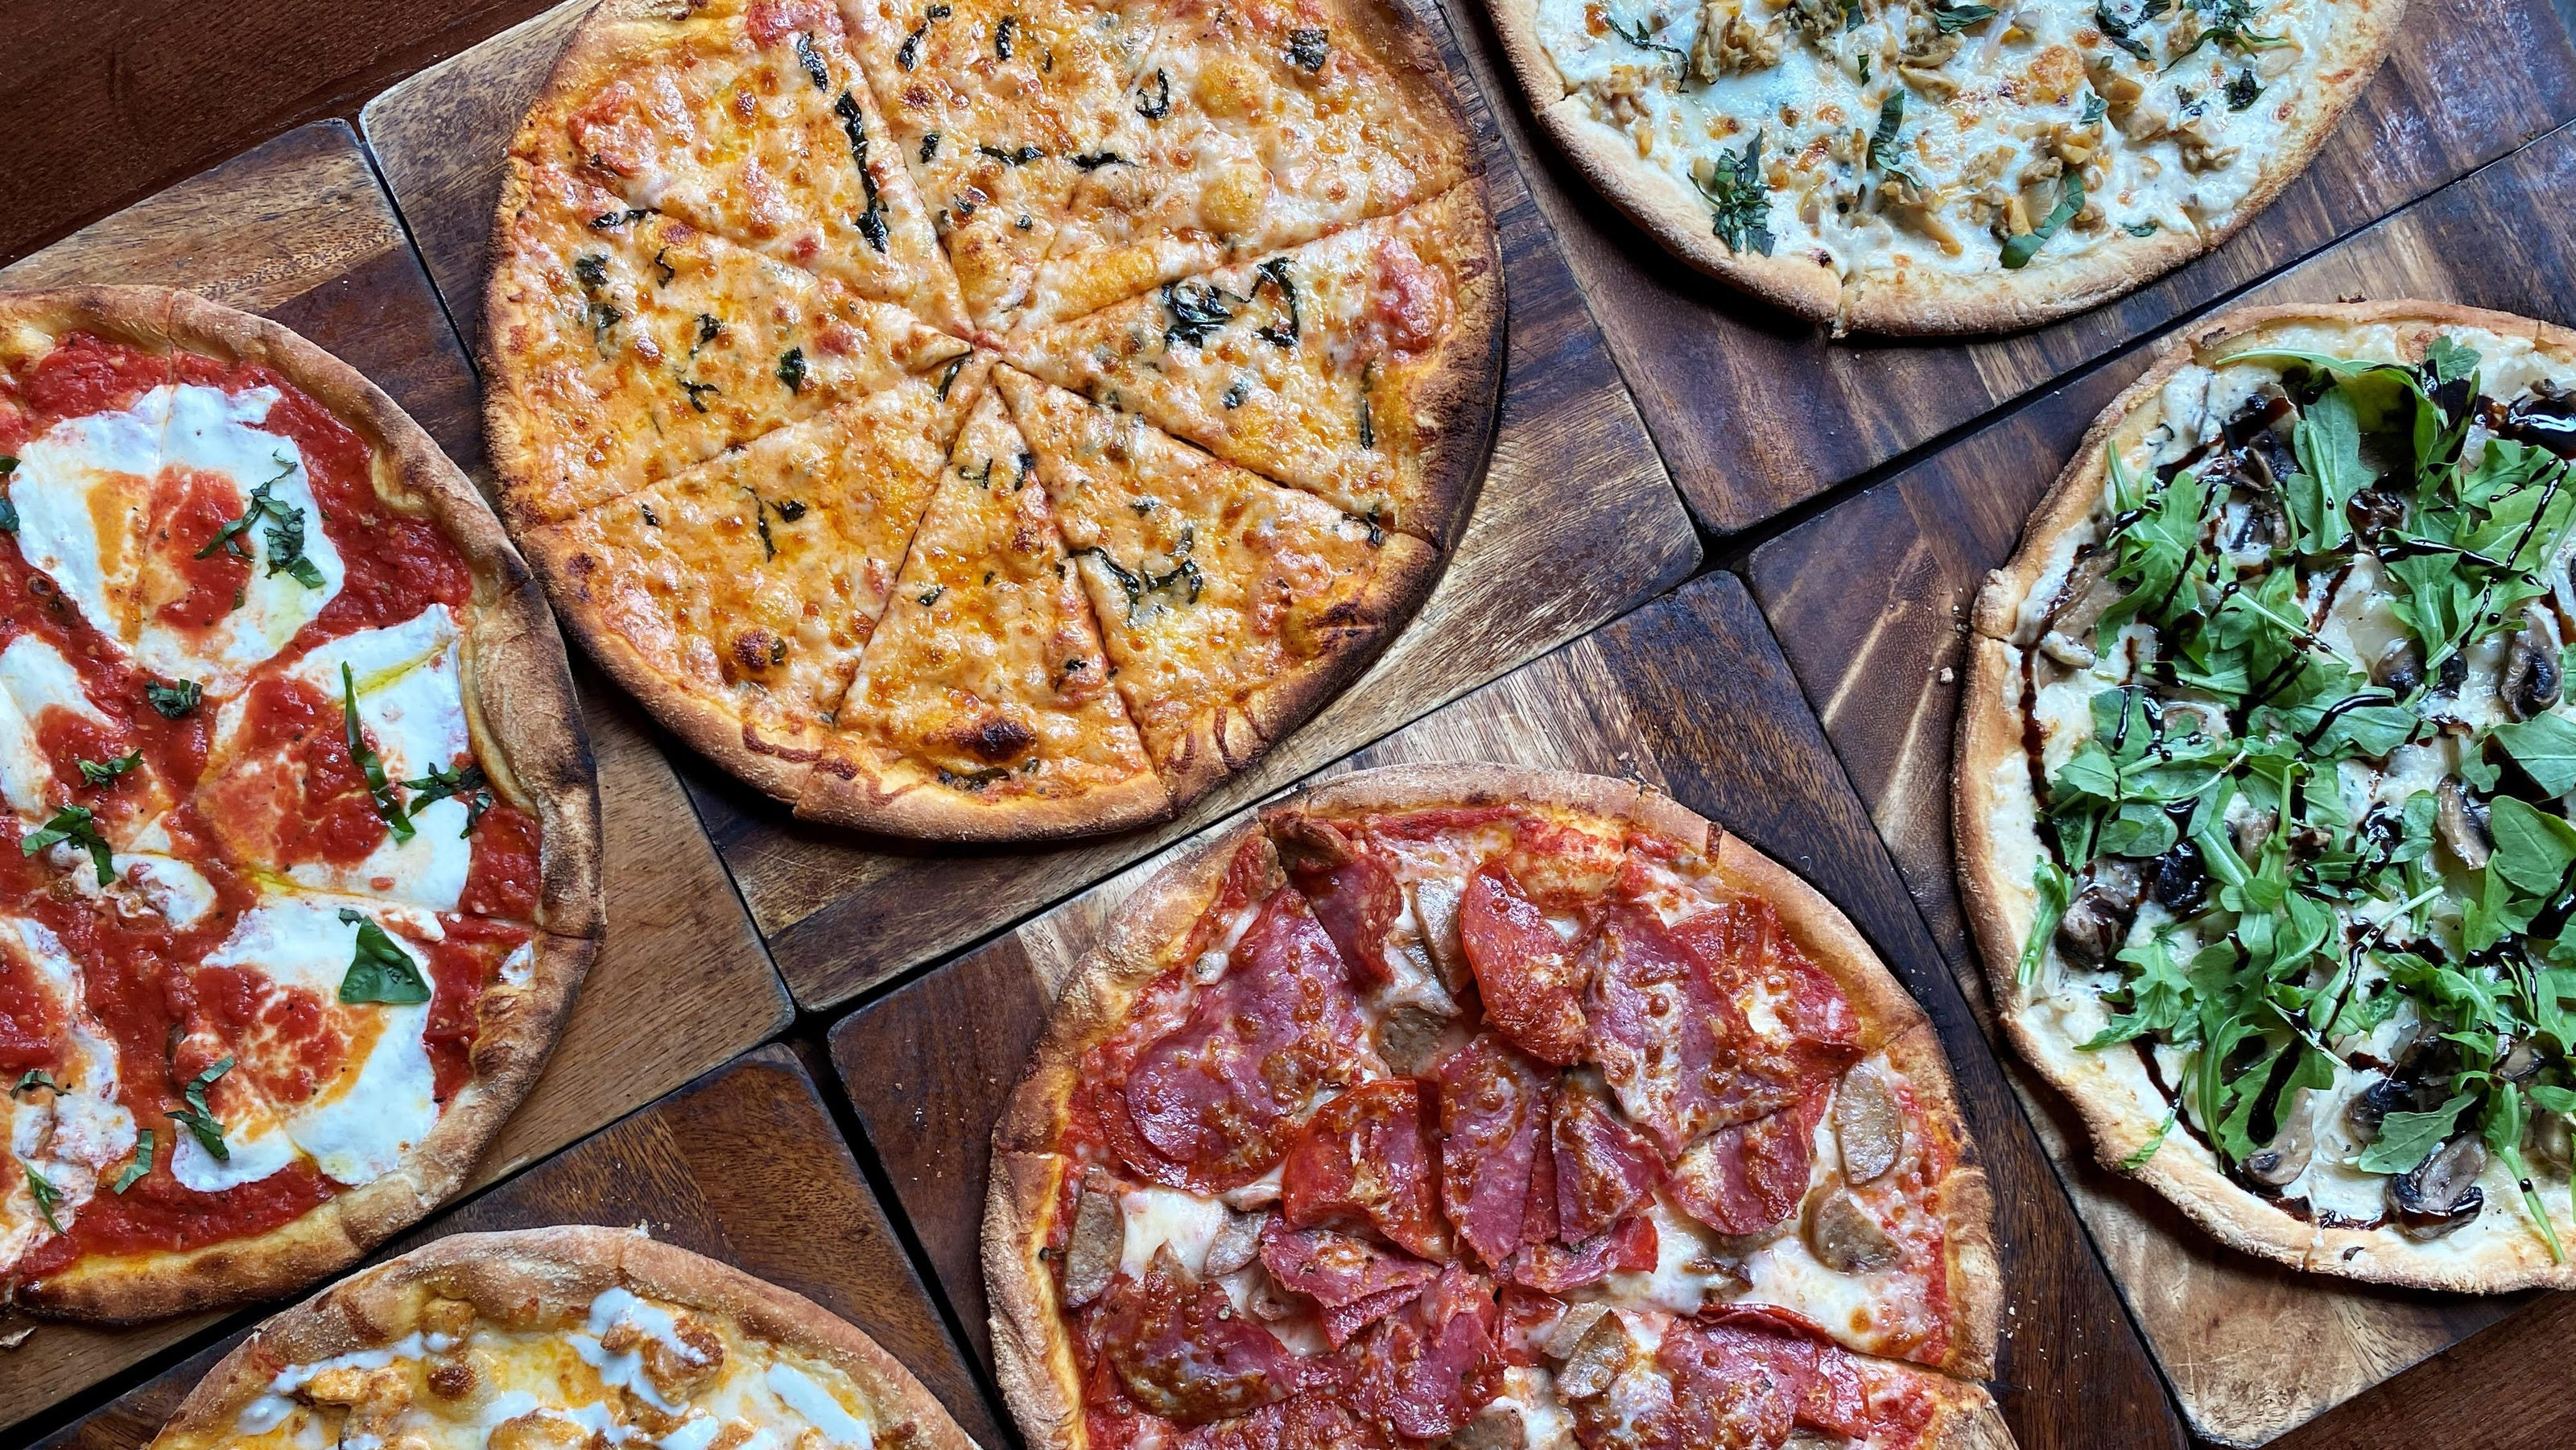 97346495 26e9 4179 8d0e 68ebd5c170ec pizza jpg?crop=4031,2268,x0,y302&width=3200&height=1801&format=pjpg&auto=webp.